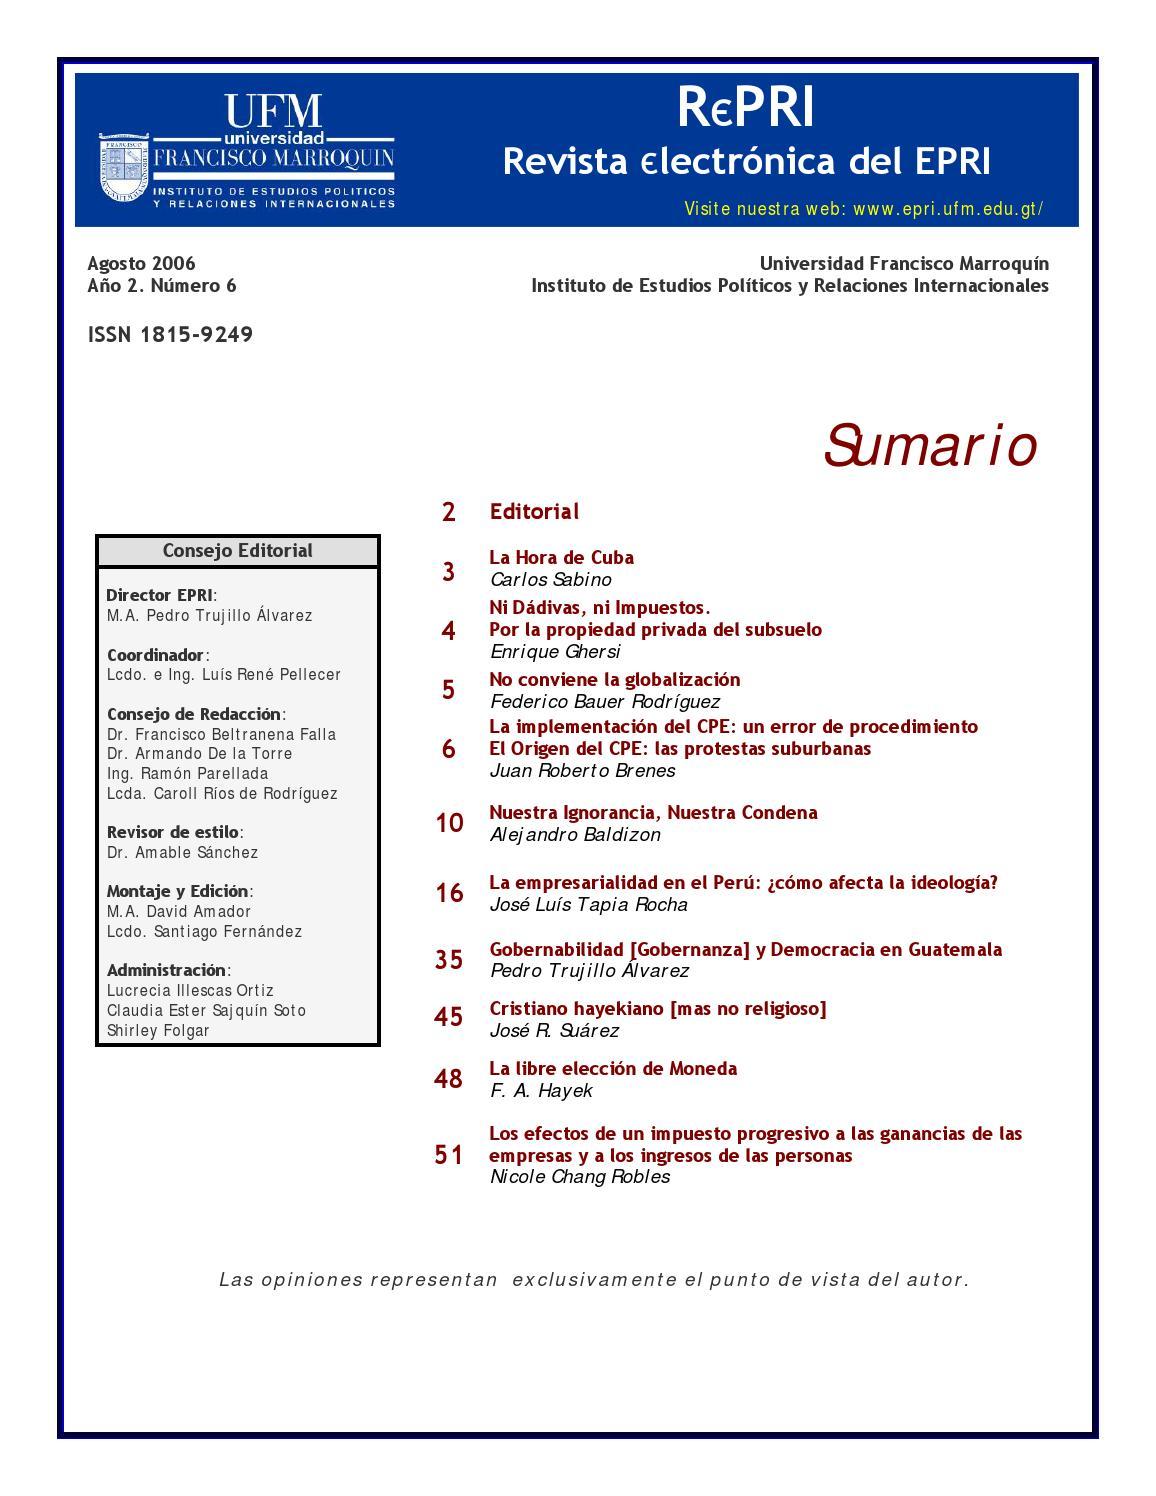 Fallas comunes en tragamonedas reseña de casino Amadora - 22672